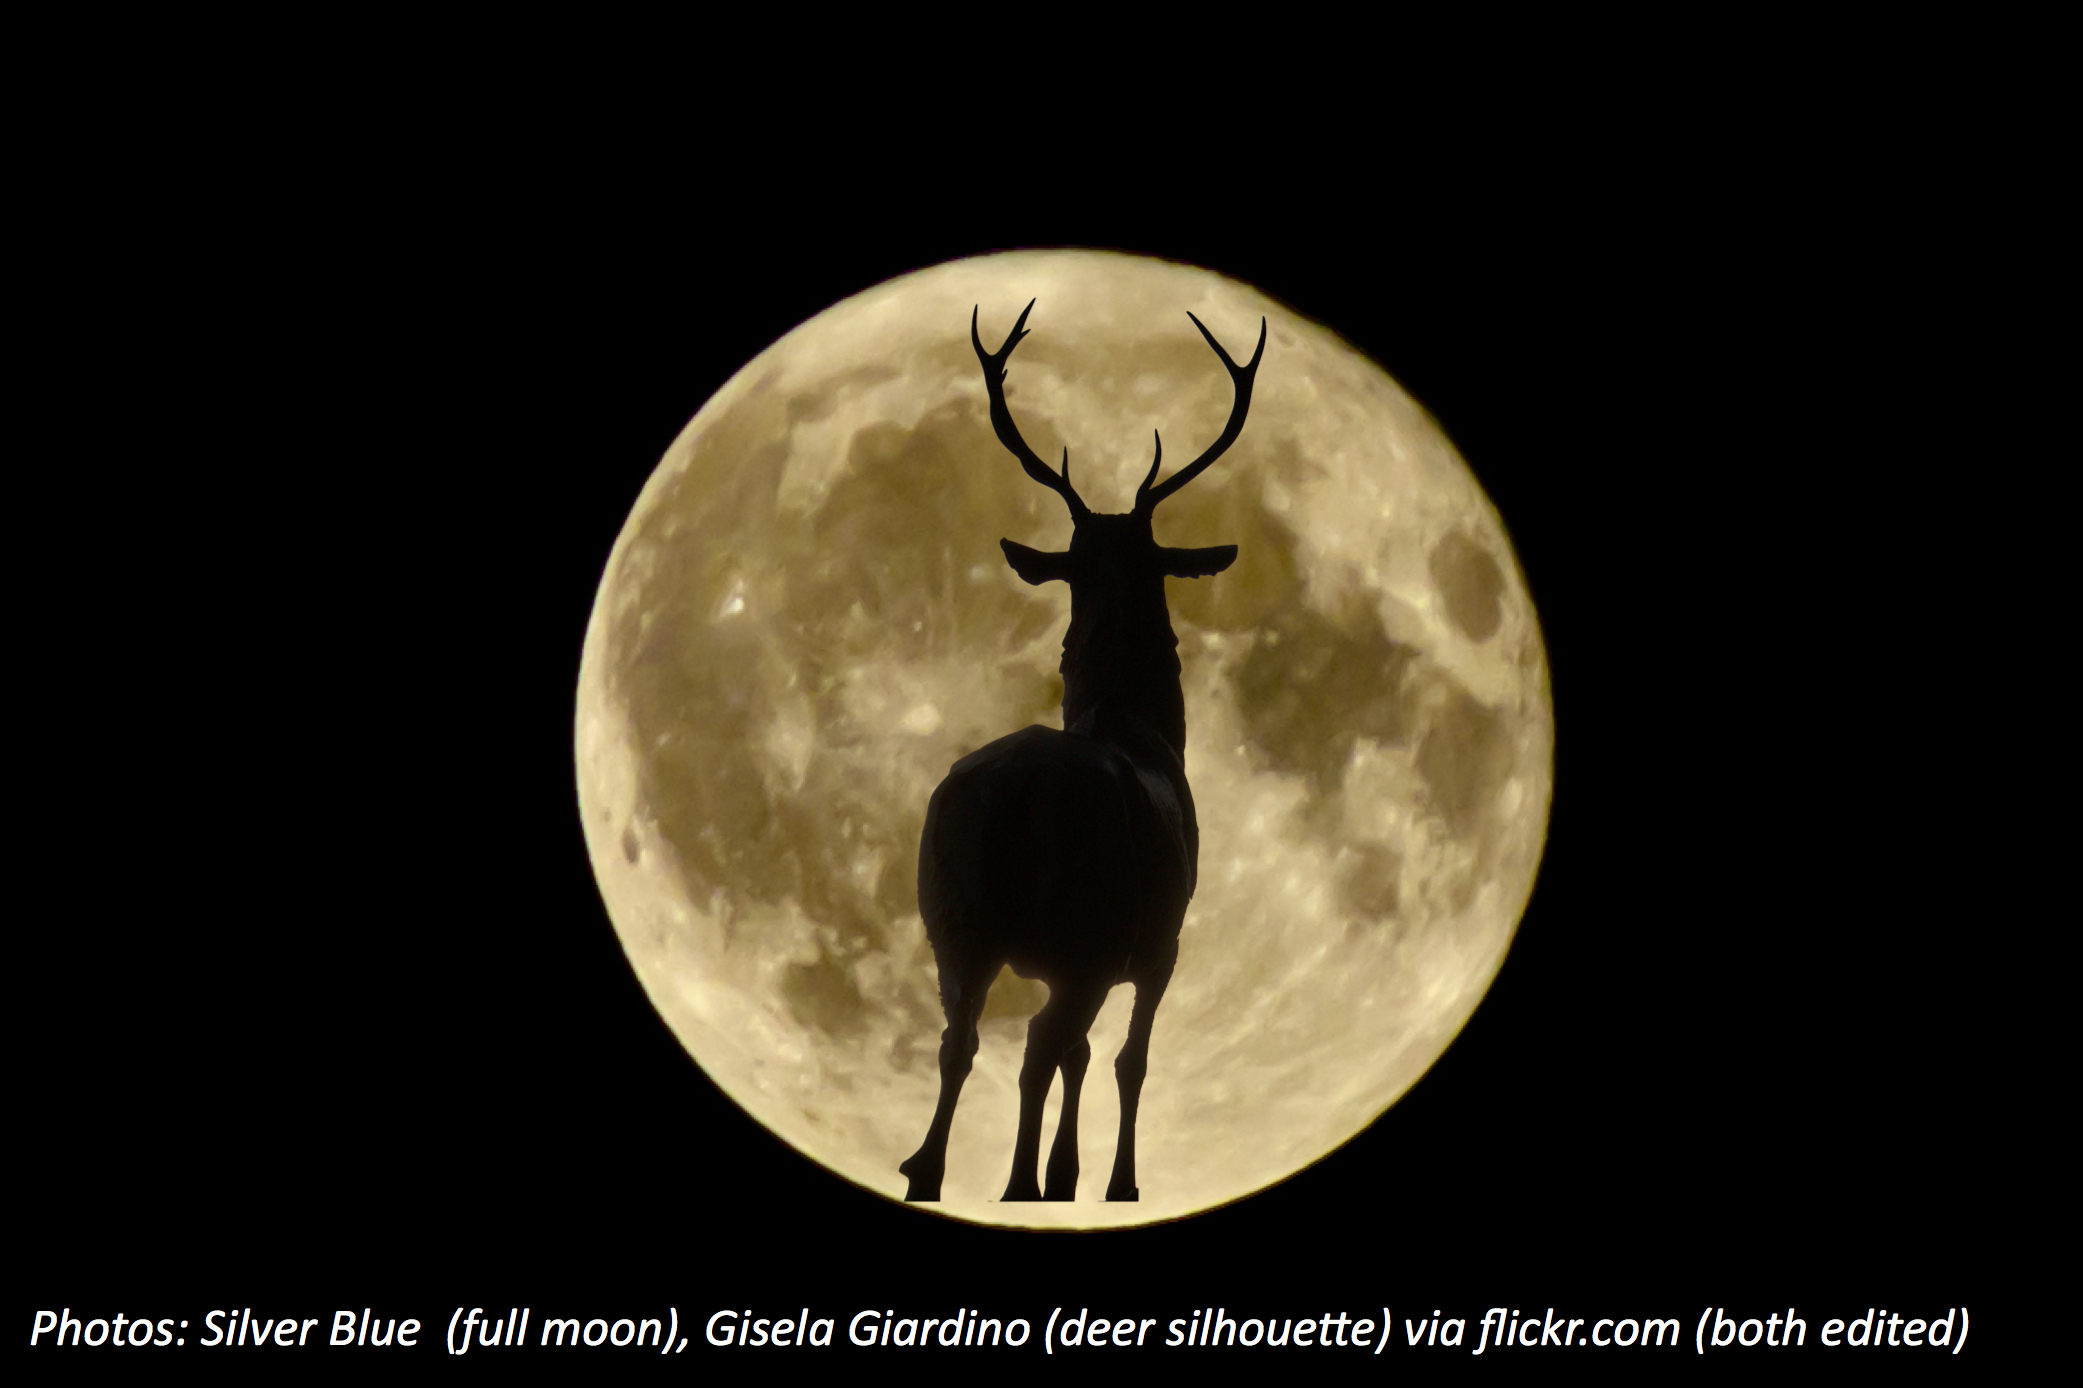 The Buck Moon Stops Here